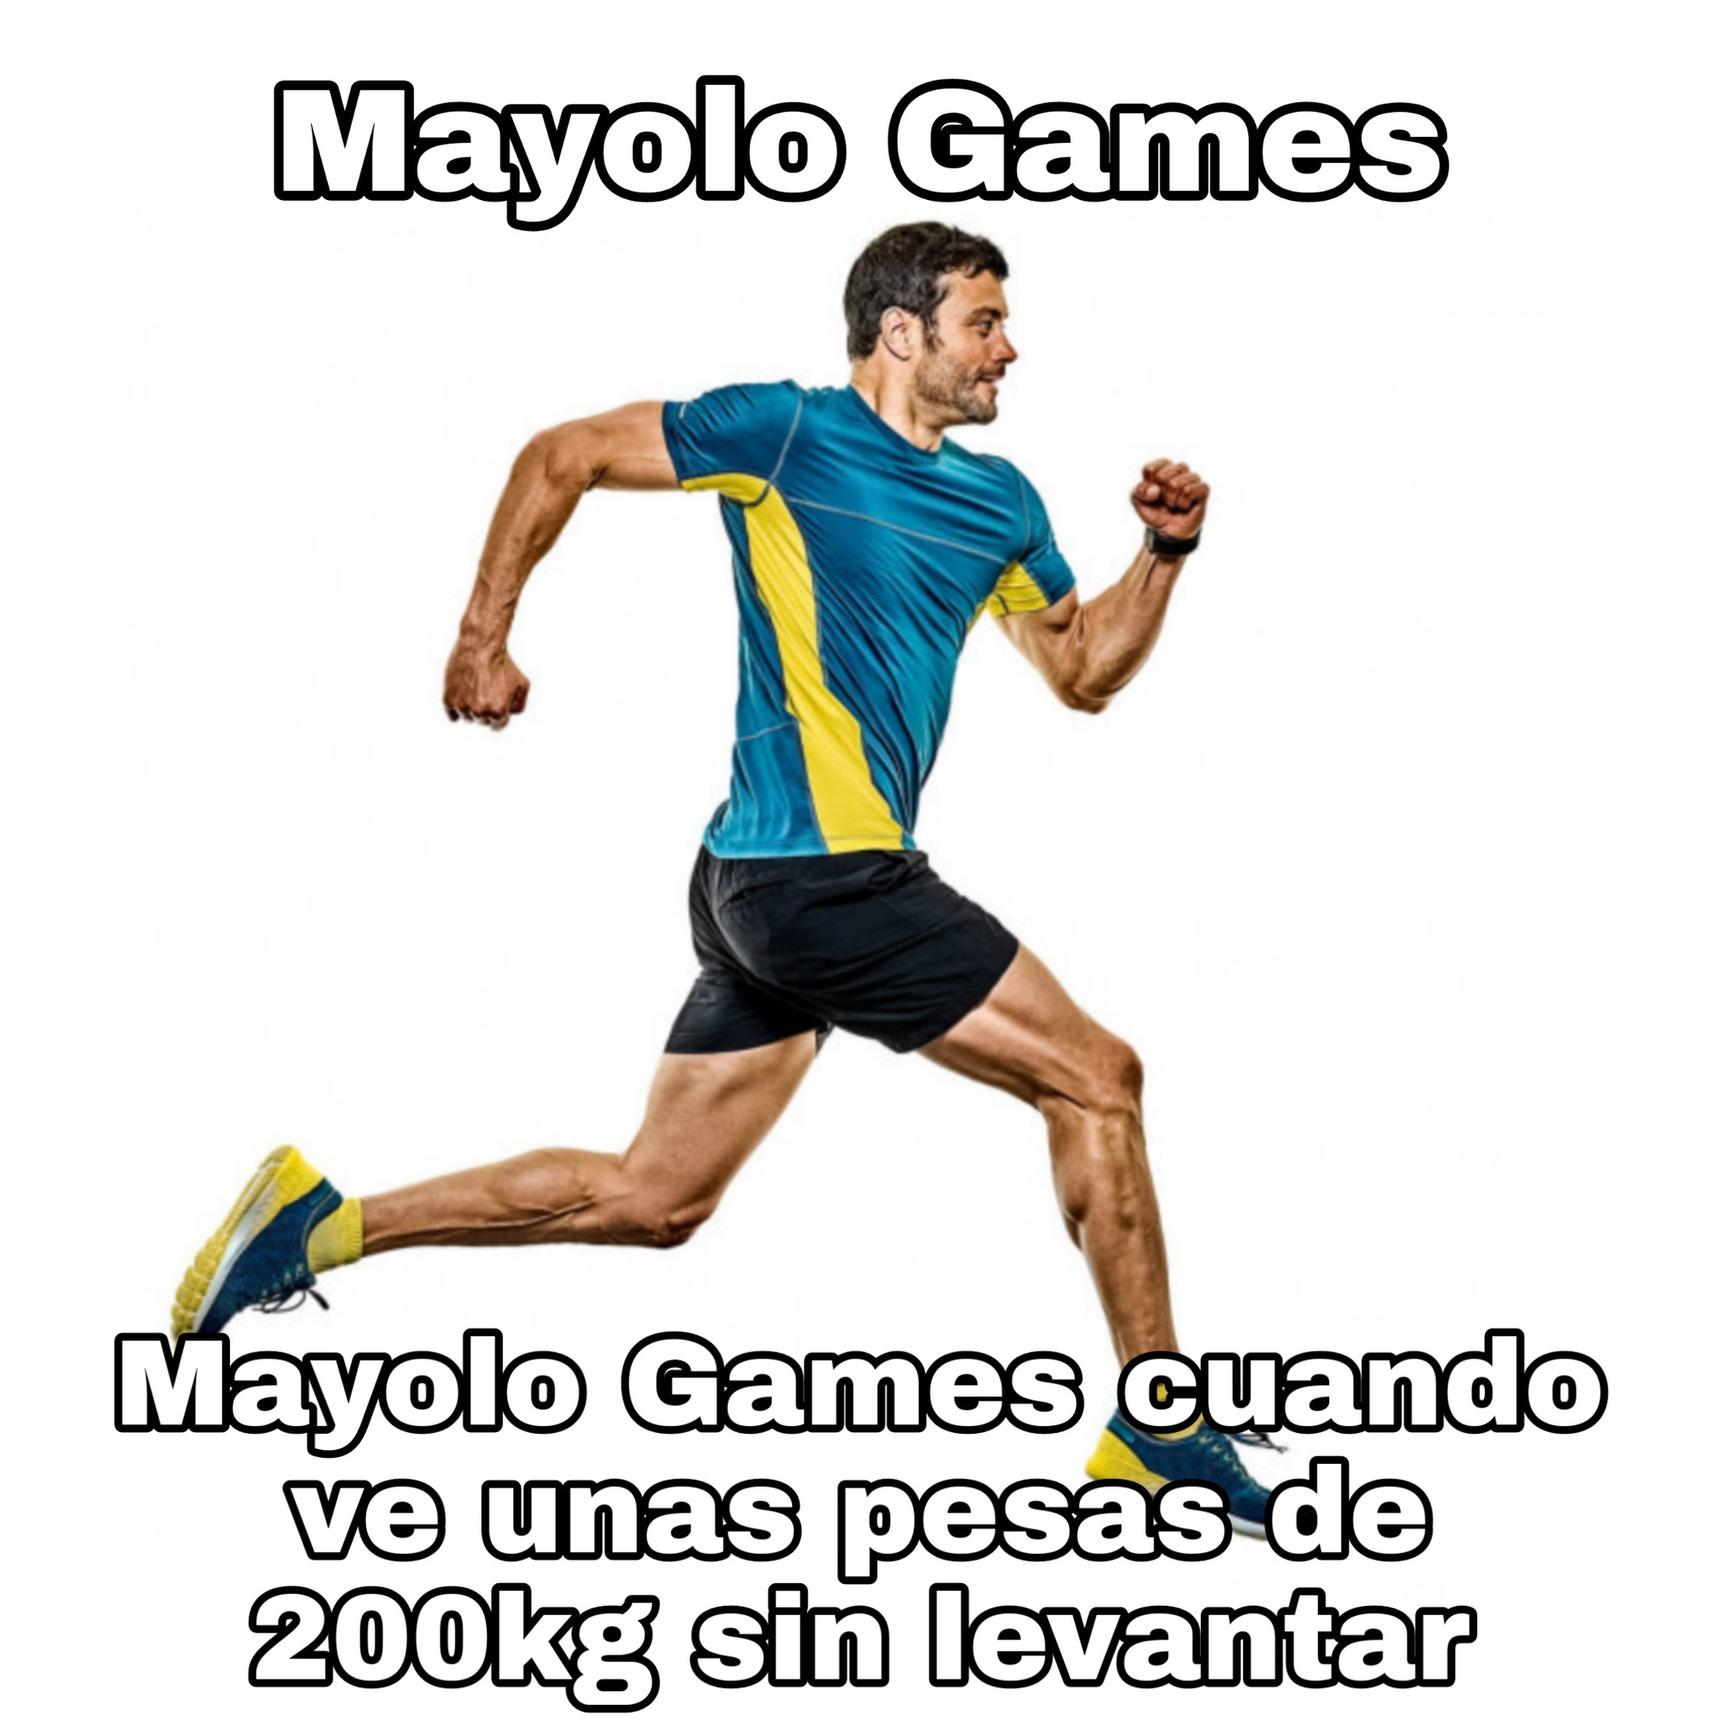 Alto chad el Mayolo Games, mi idolo - meme